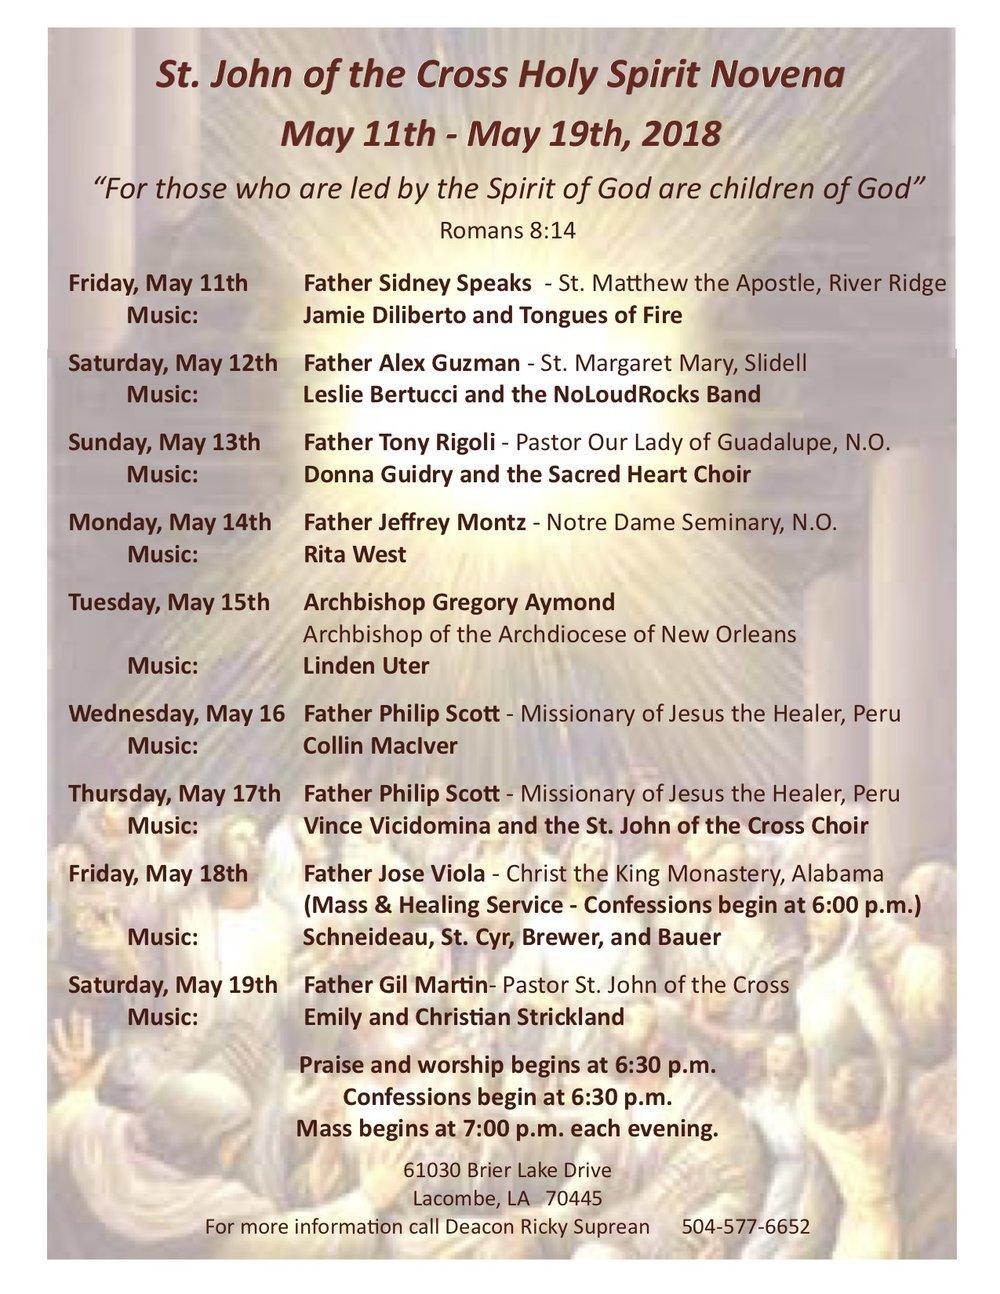 Catholic novenas for healing